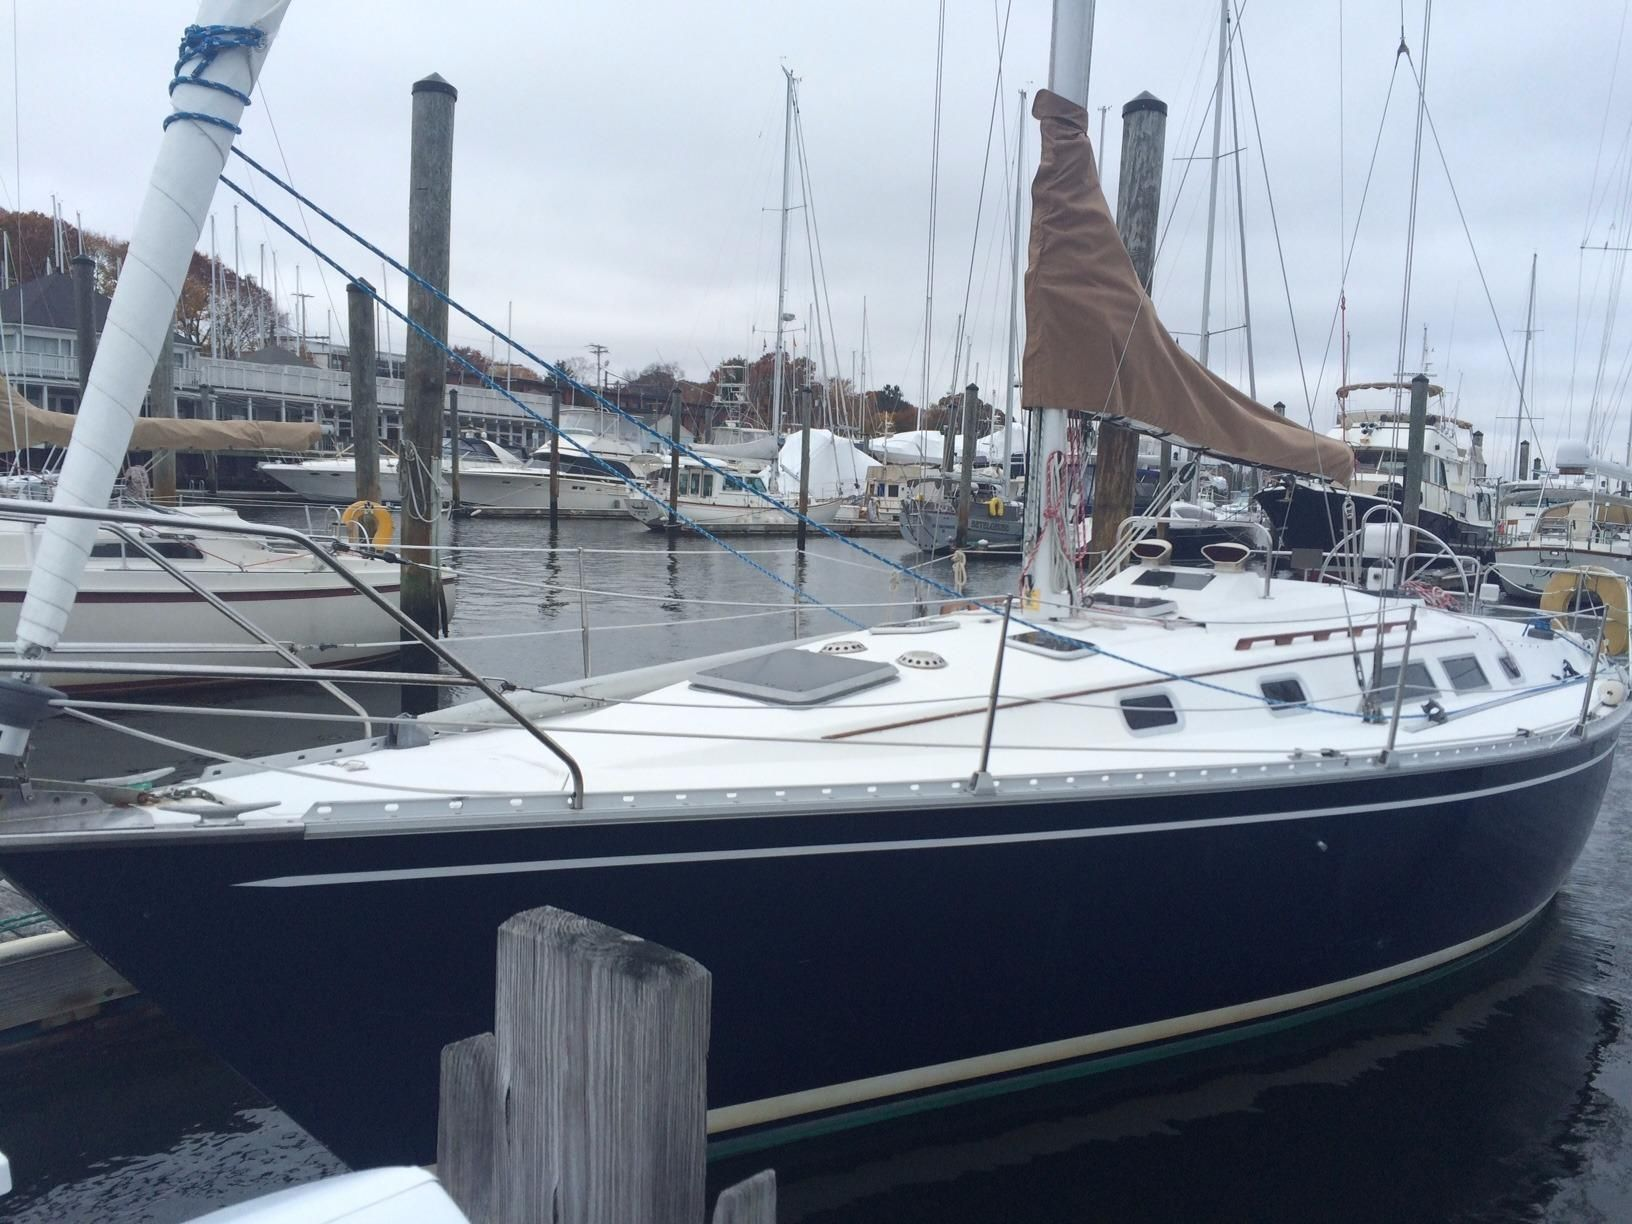 1983 Hunter 34 Sail Boat For Sale Www Yachtworld Com